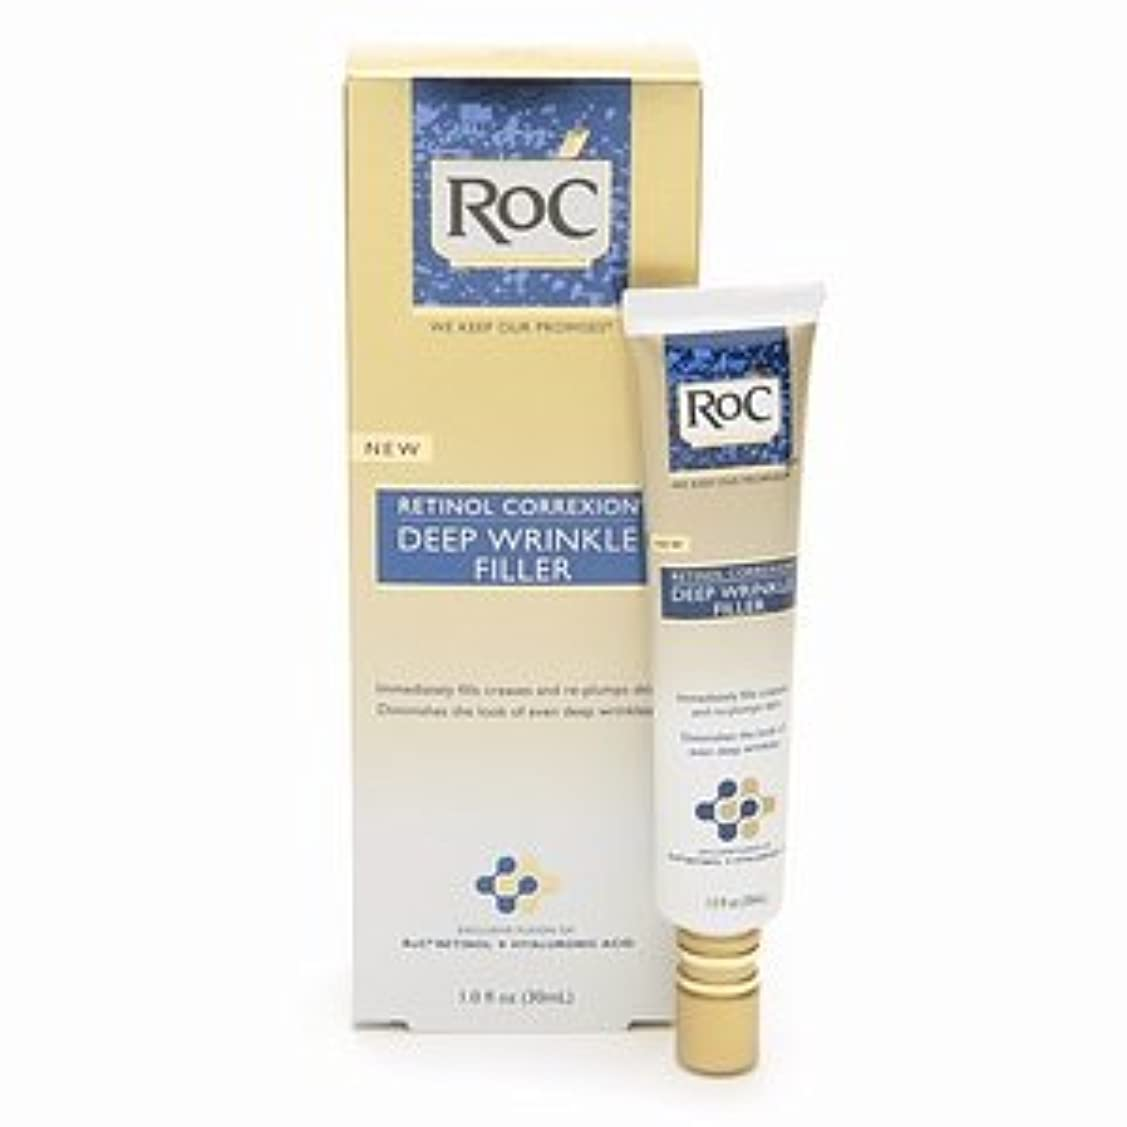 RoC レチノール コレクション ディープリンクル フィラー RoC Retinol Correxion Deep Wrinkle Filler